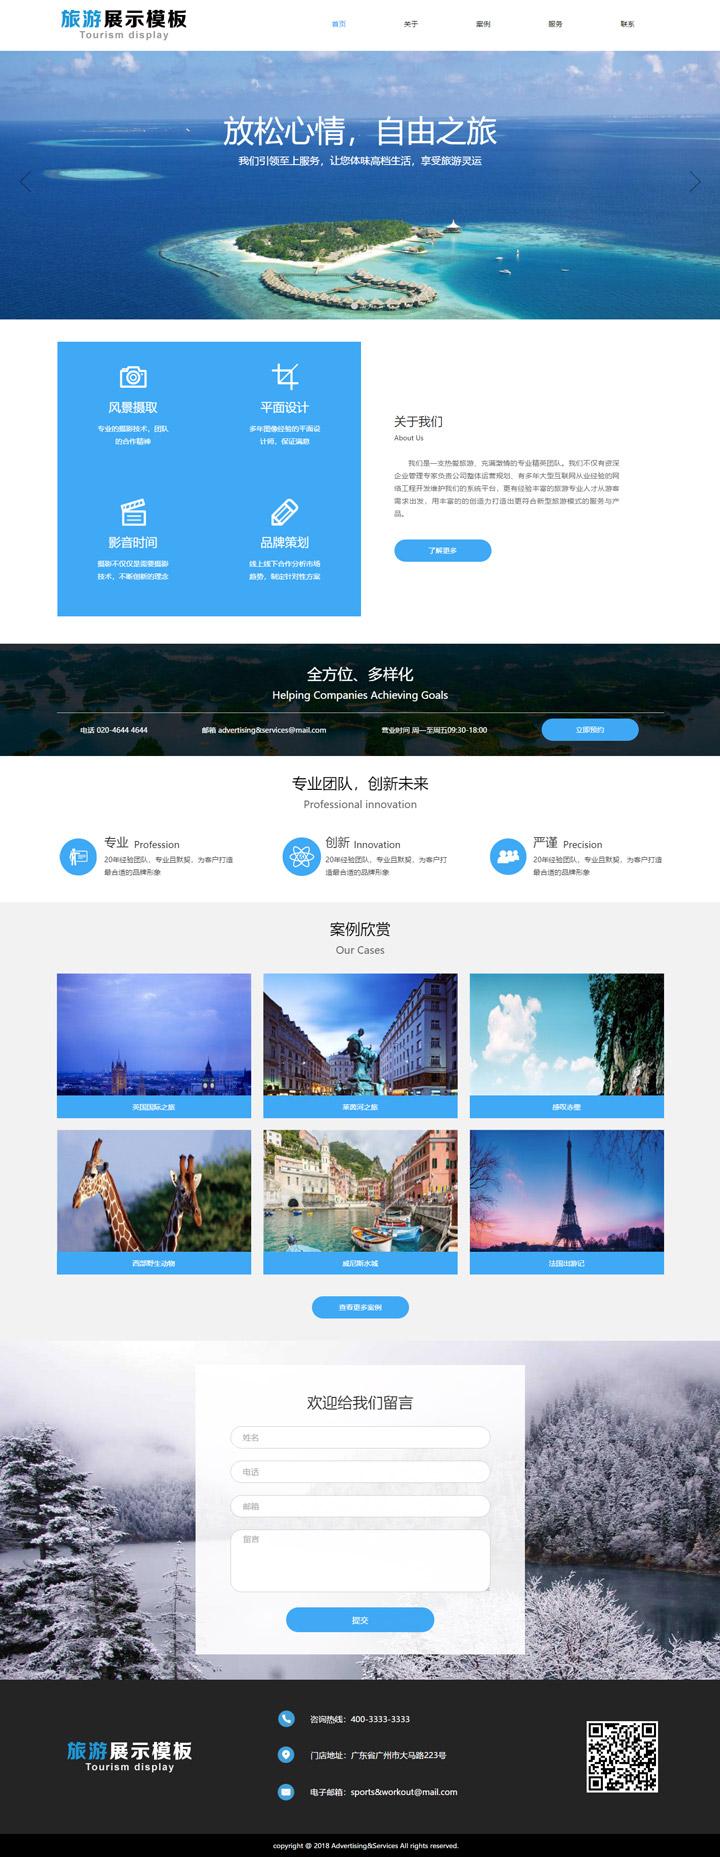 Global旅游展示模板